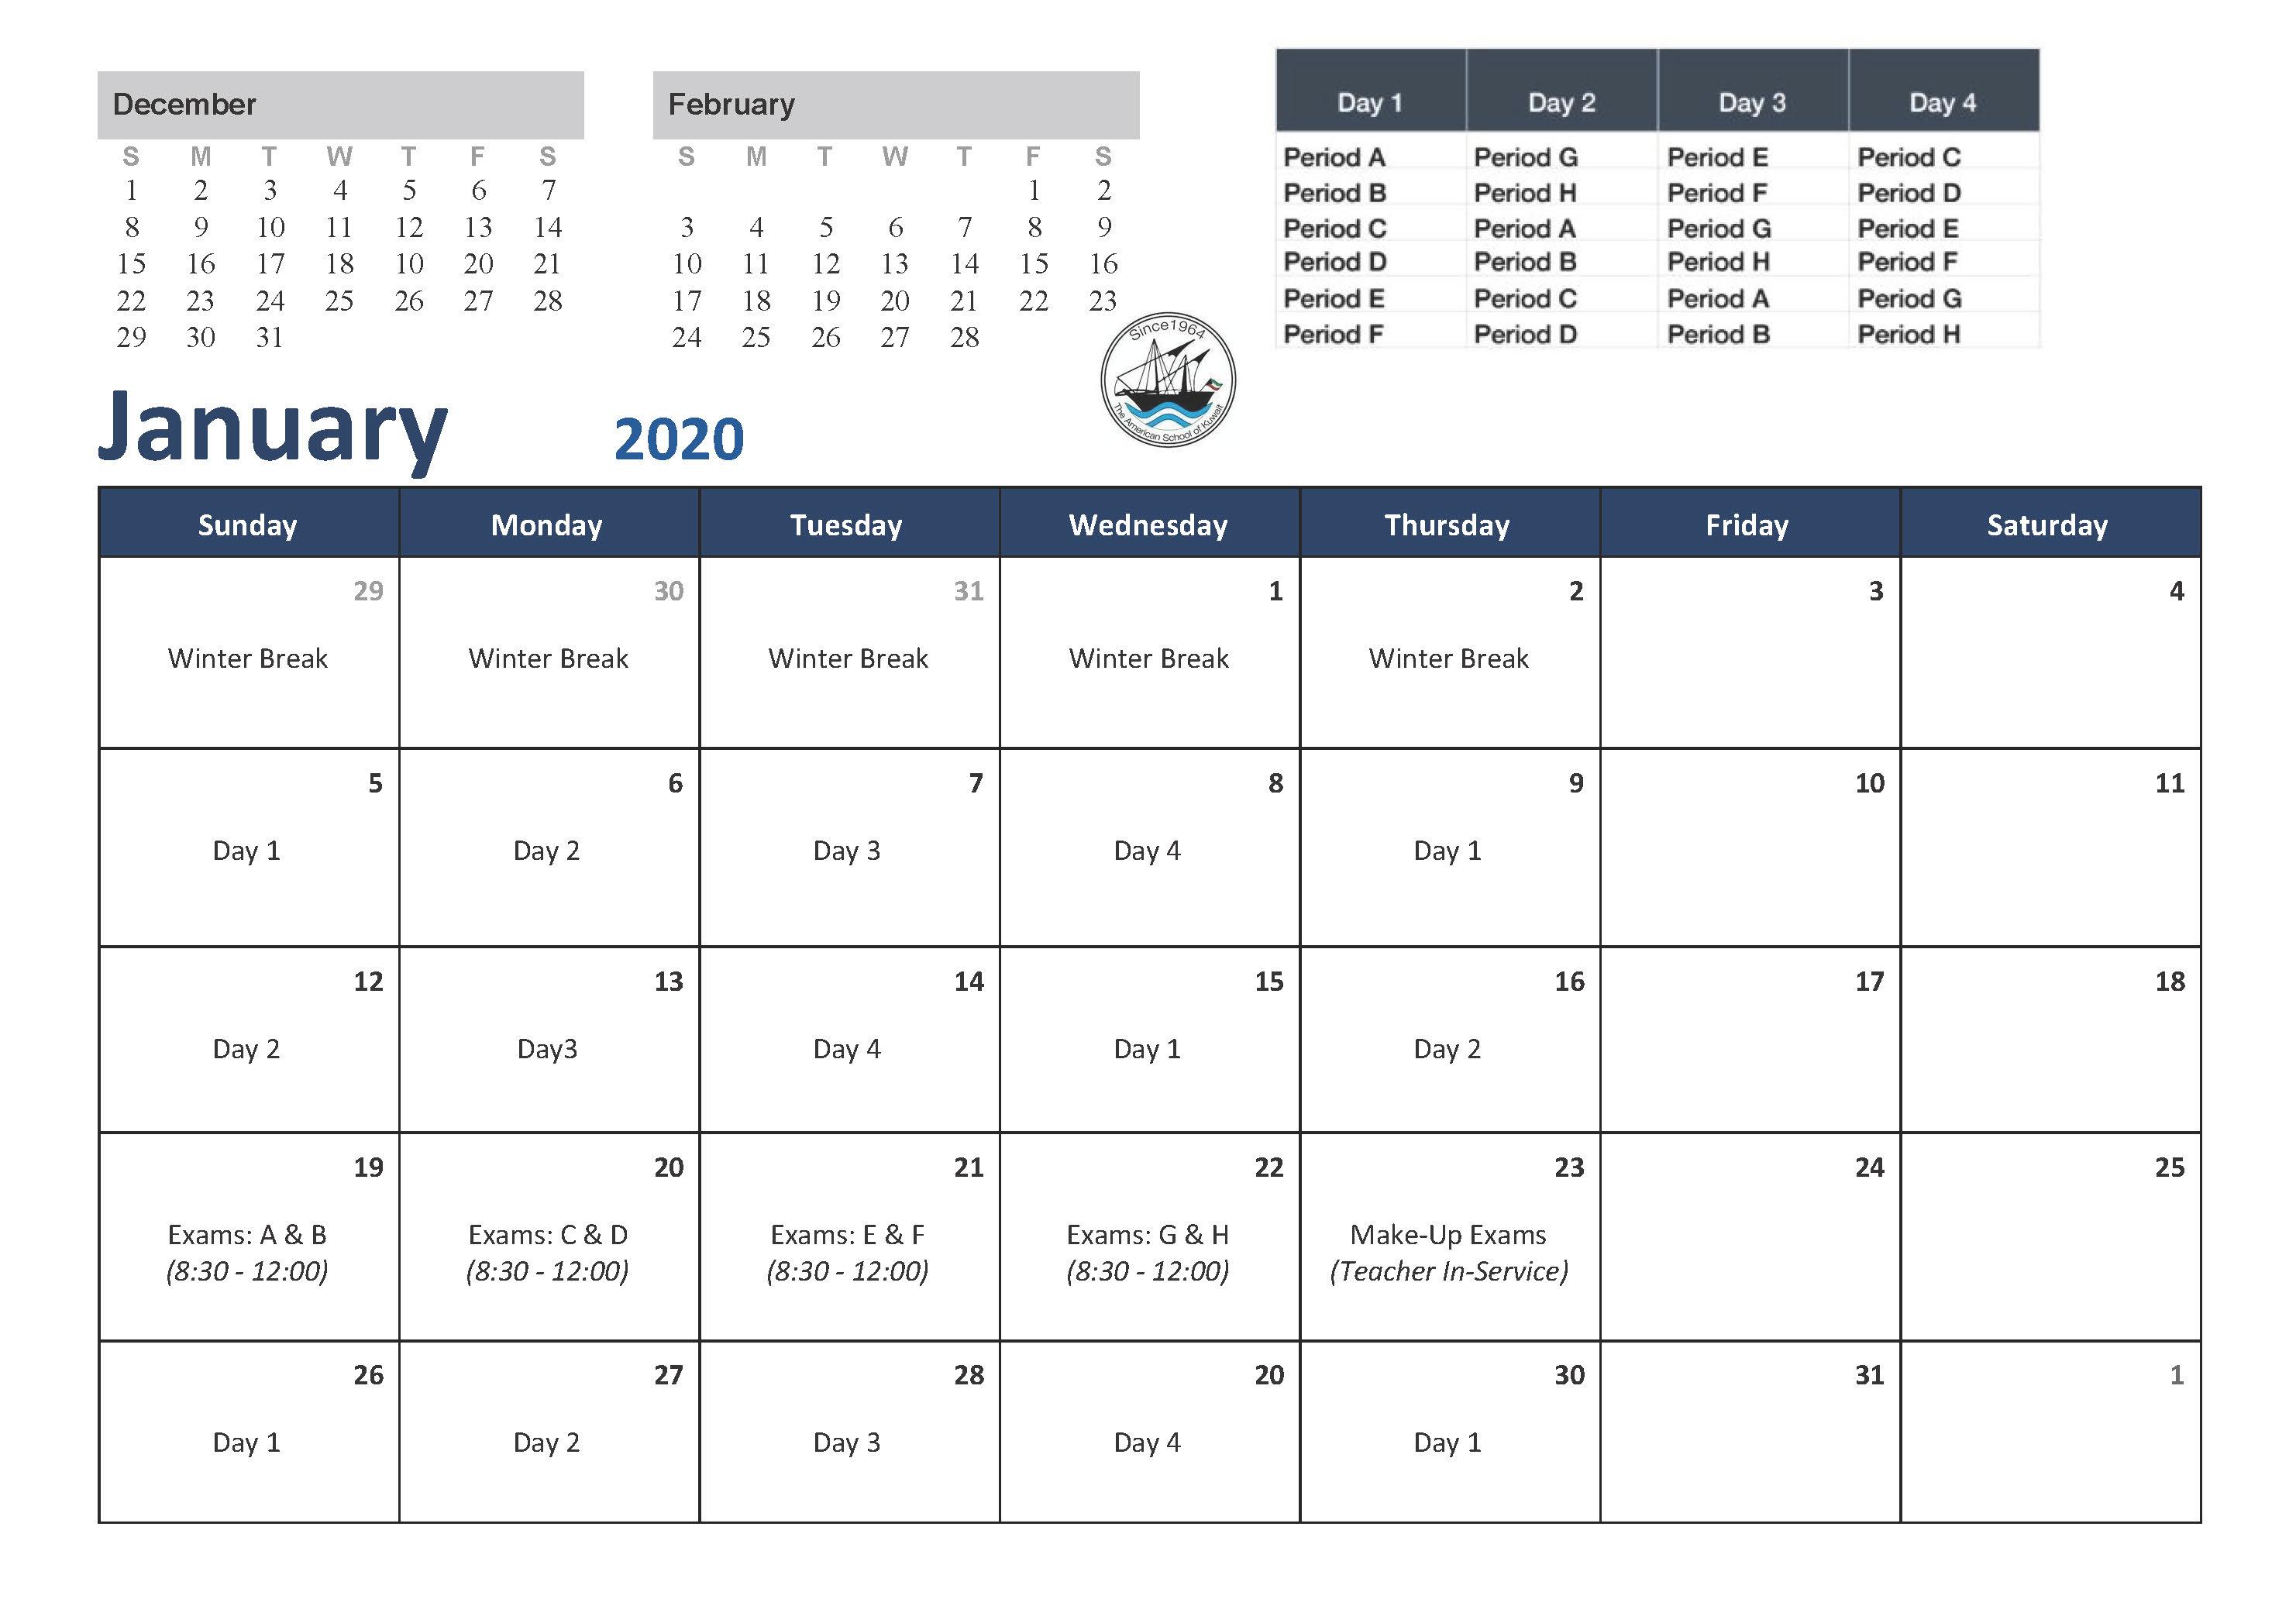 5. January 2020